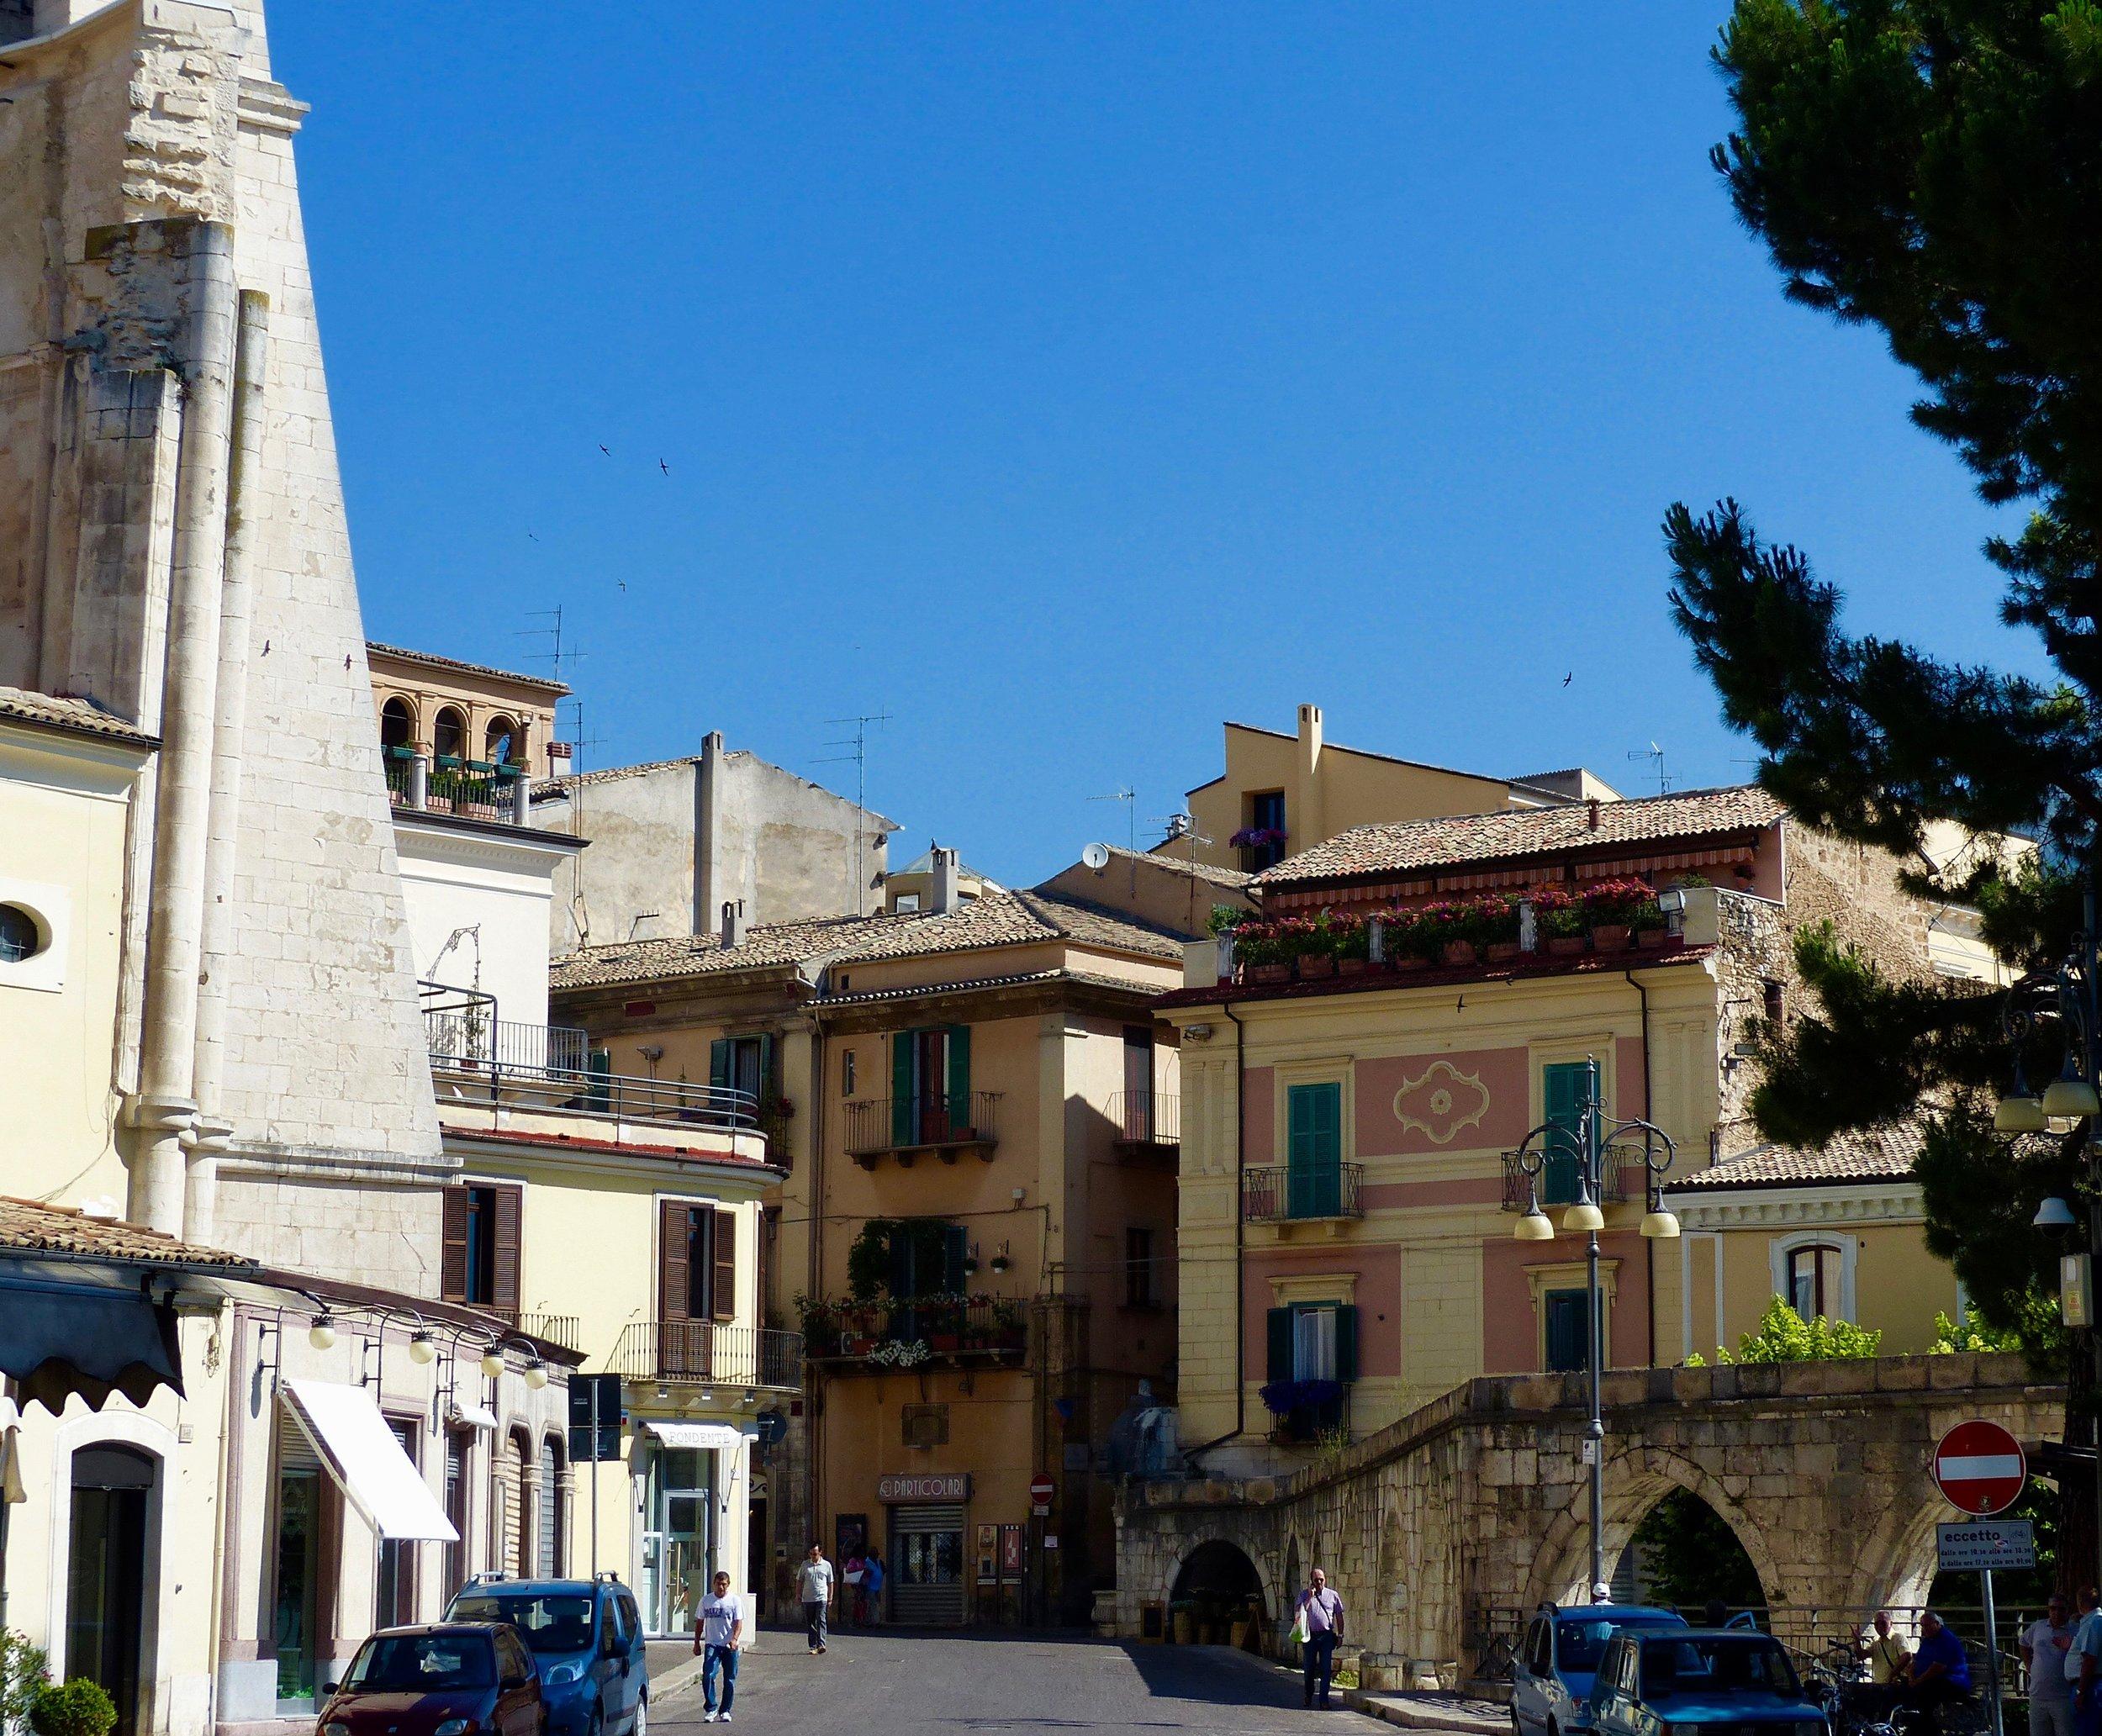 sulmona-piazza-6.jpg